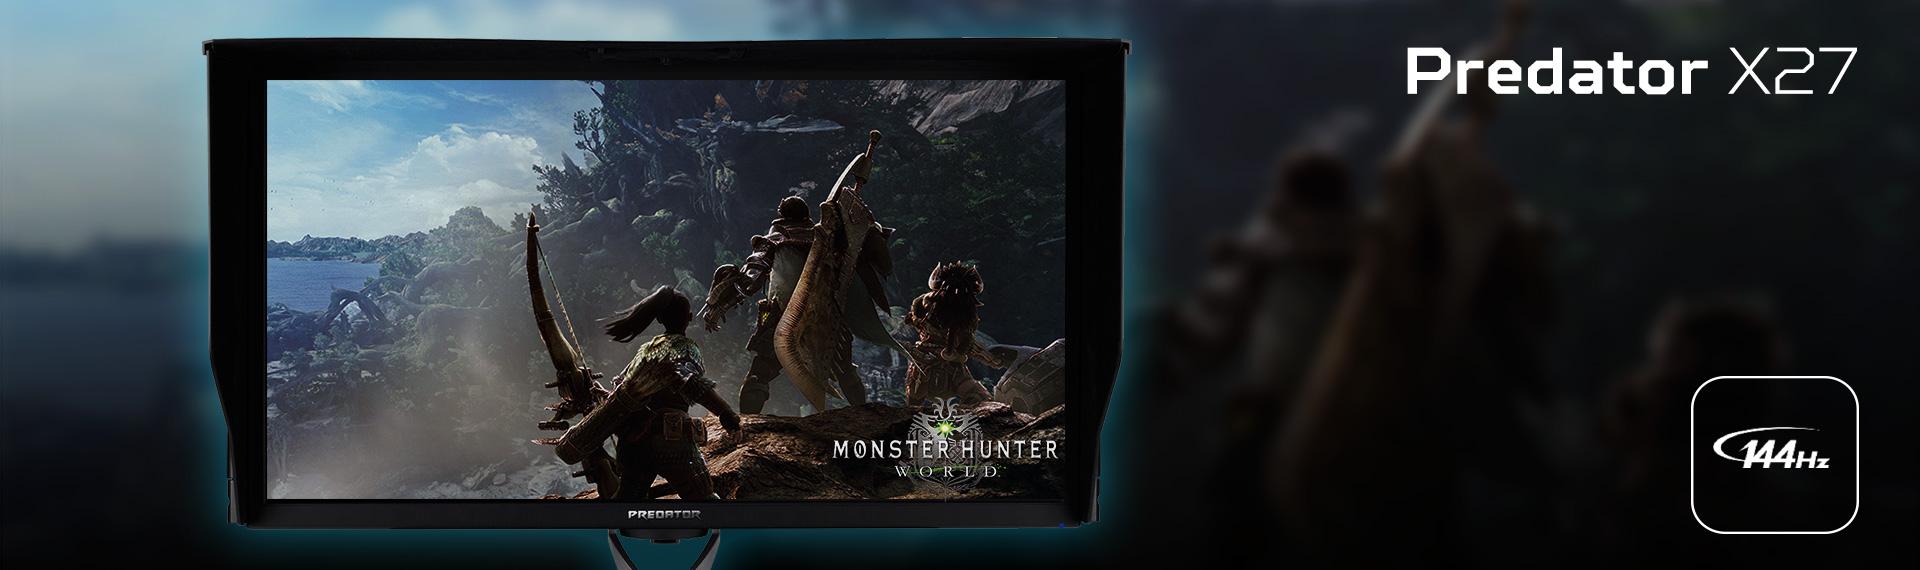 Monitor Predator X27, Menampilkan Visual Gambar Tajam dan Nyata